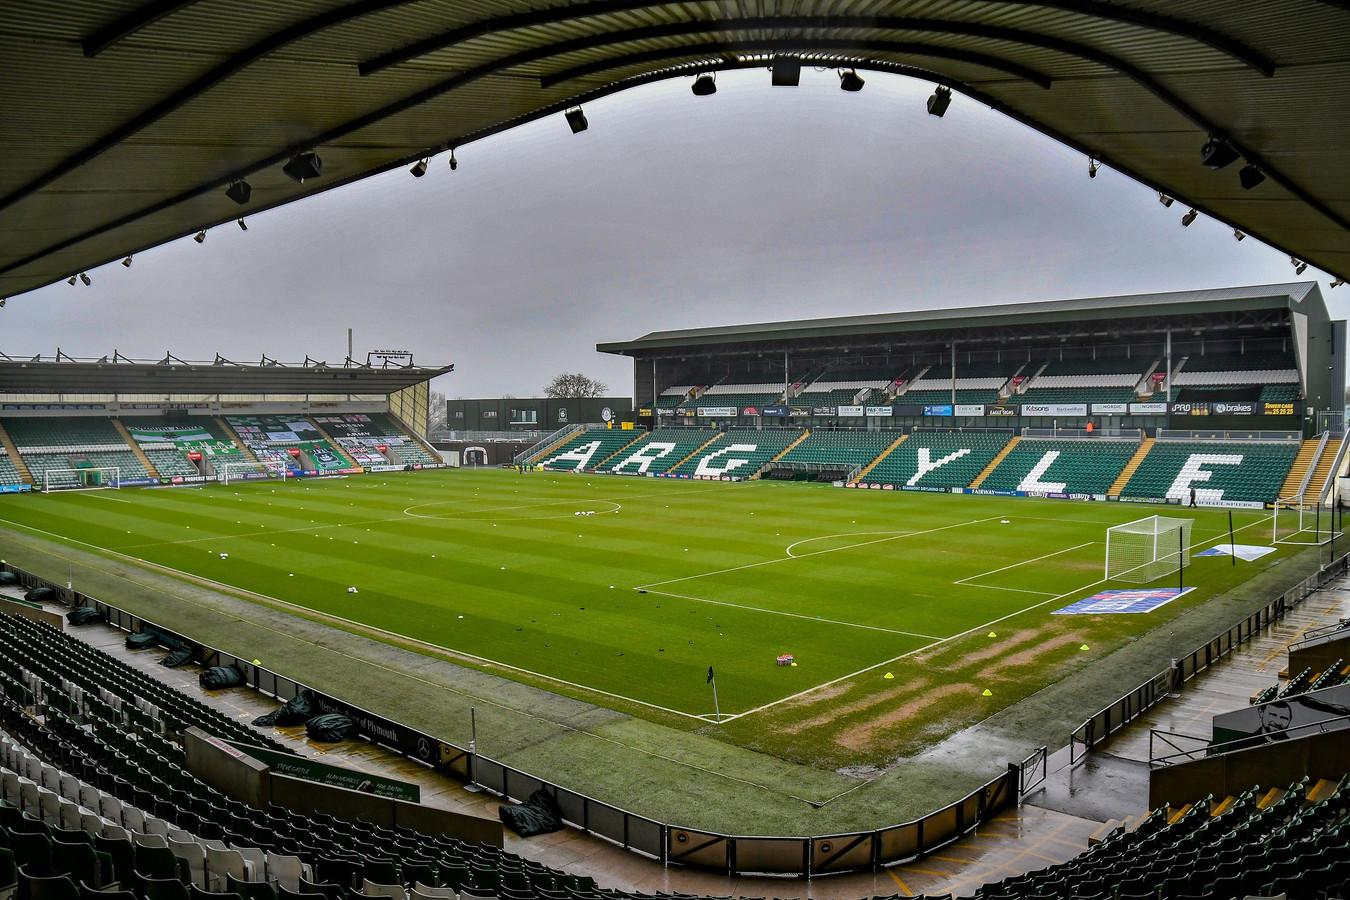 Home Park, het stadion van Plymouth Argyle.